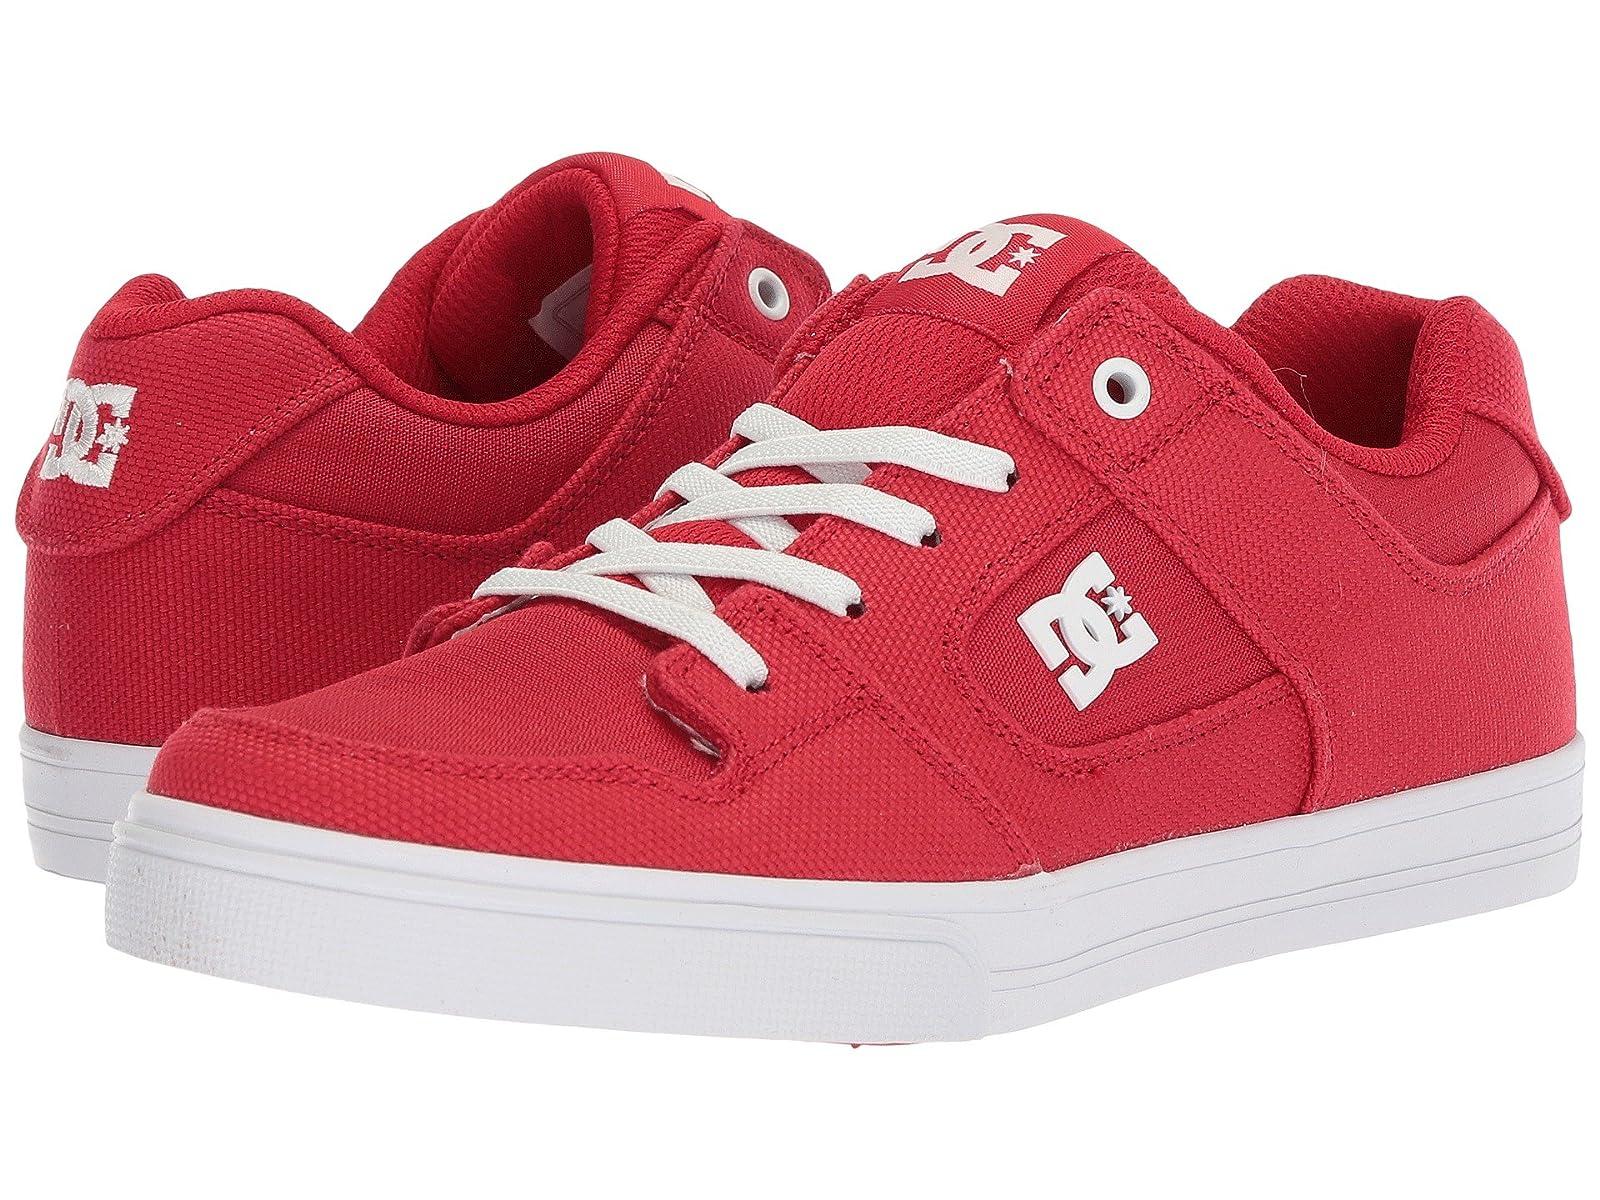 DC Kids Pure Elastic TX SE (Little Kid/Big Kid)Cheap and distinctive eye-catching shoes